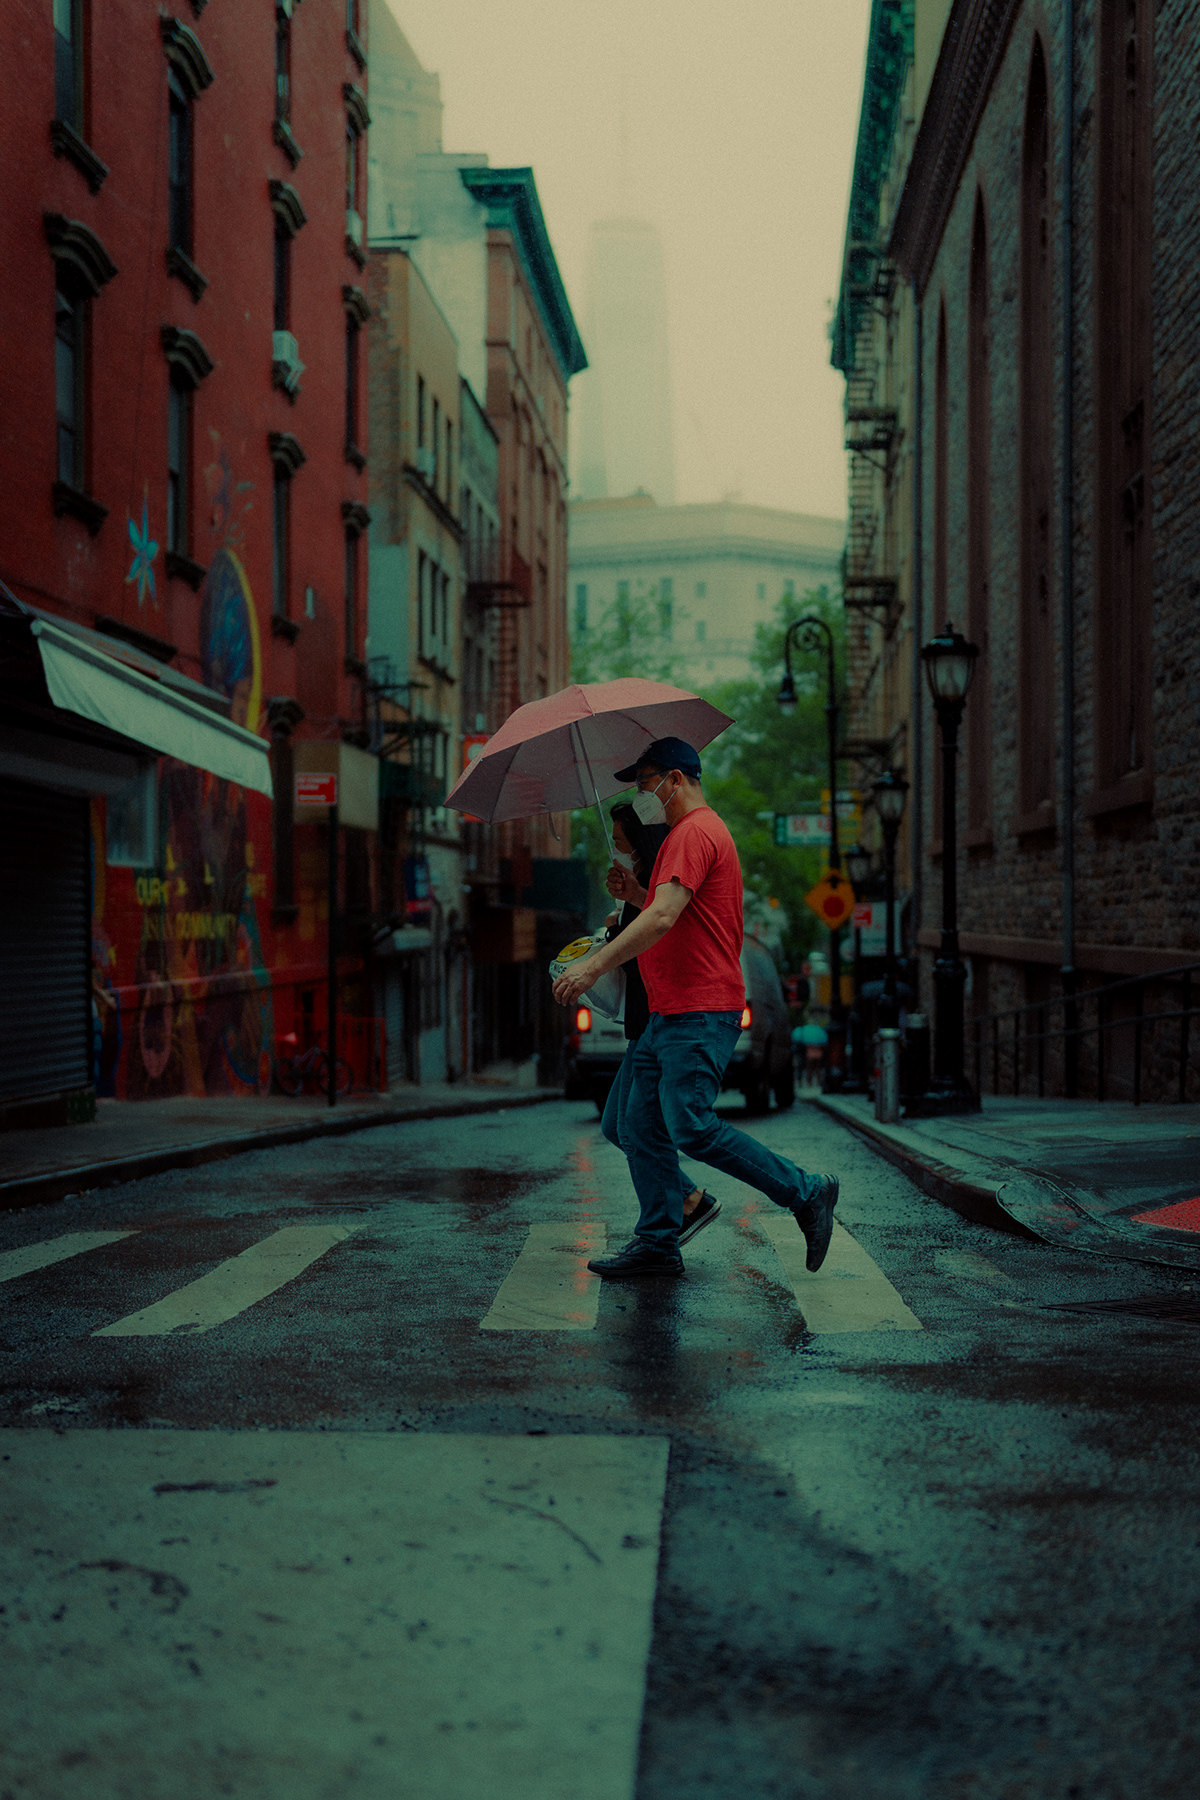 city lightroom New York nyc photographer Photography  photoshop street photography